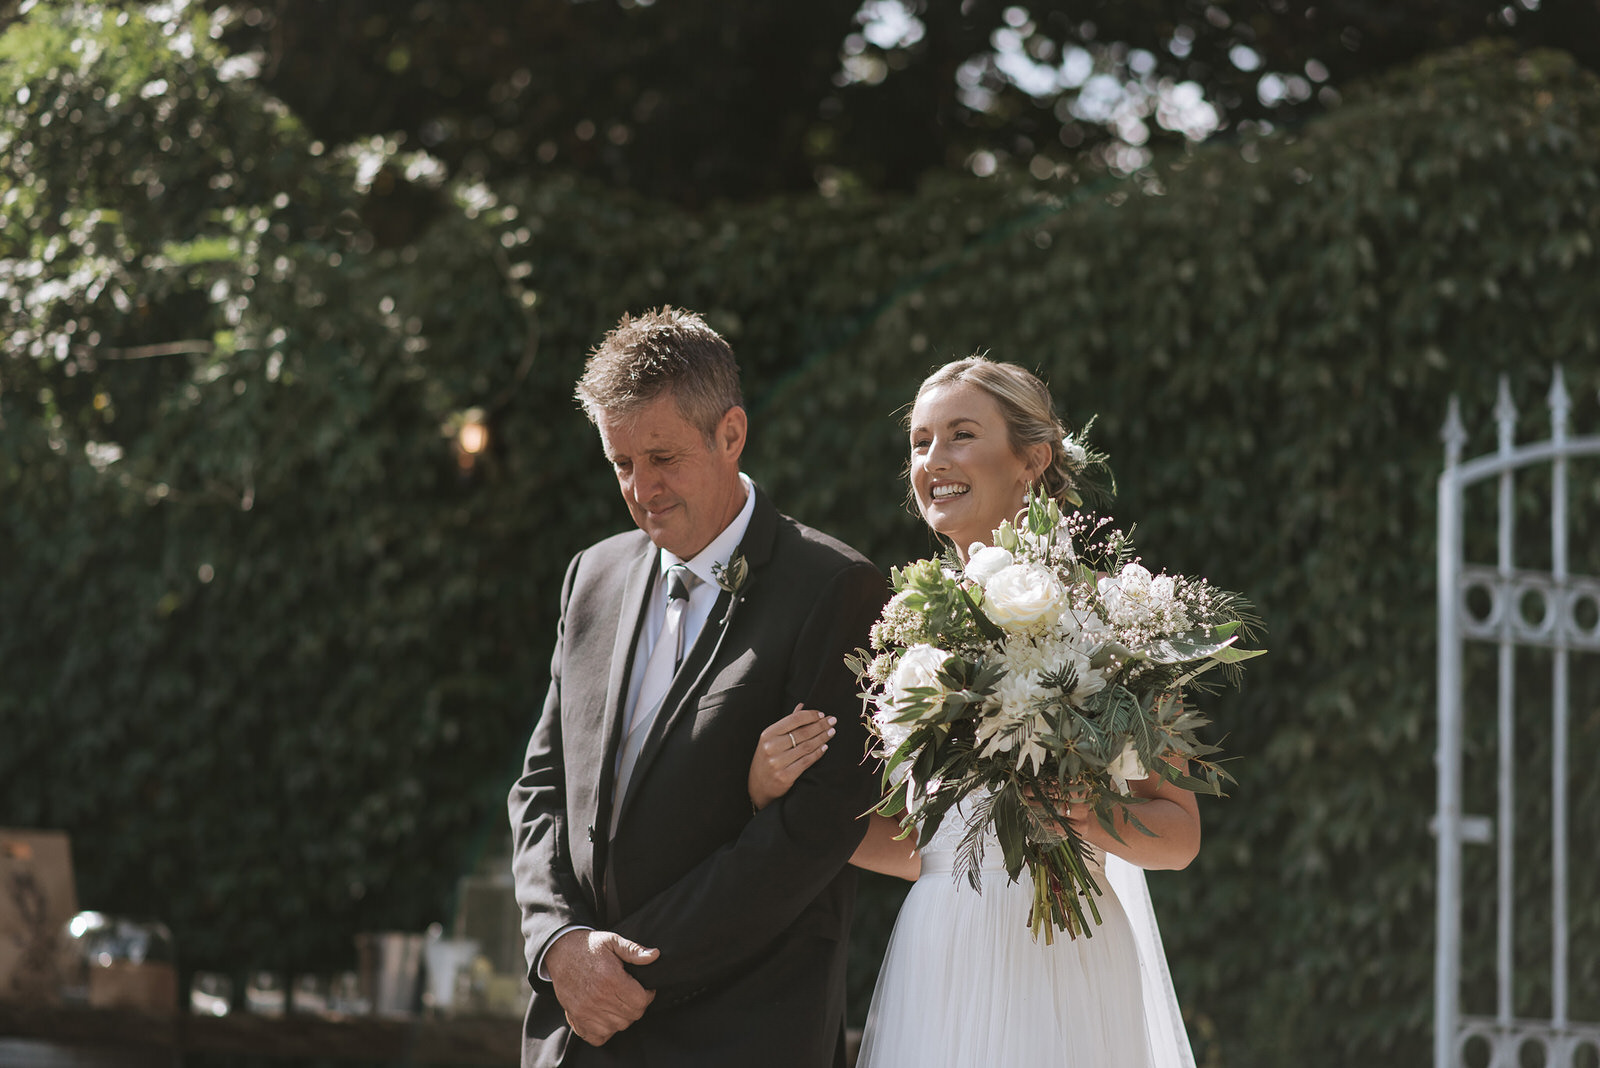 newfound-r-s-ataahua-garden-venue-tauranga-wedding-055